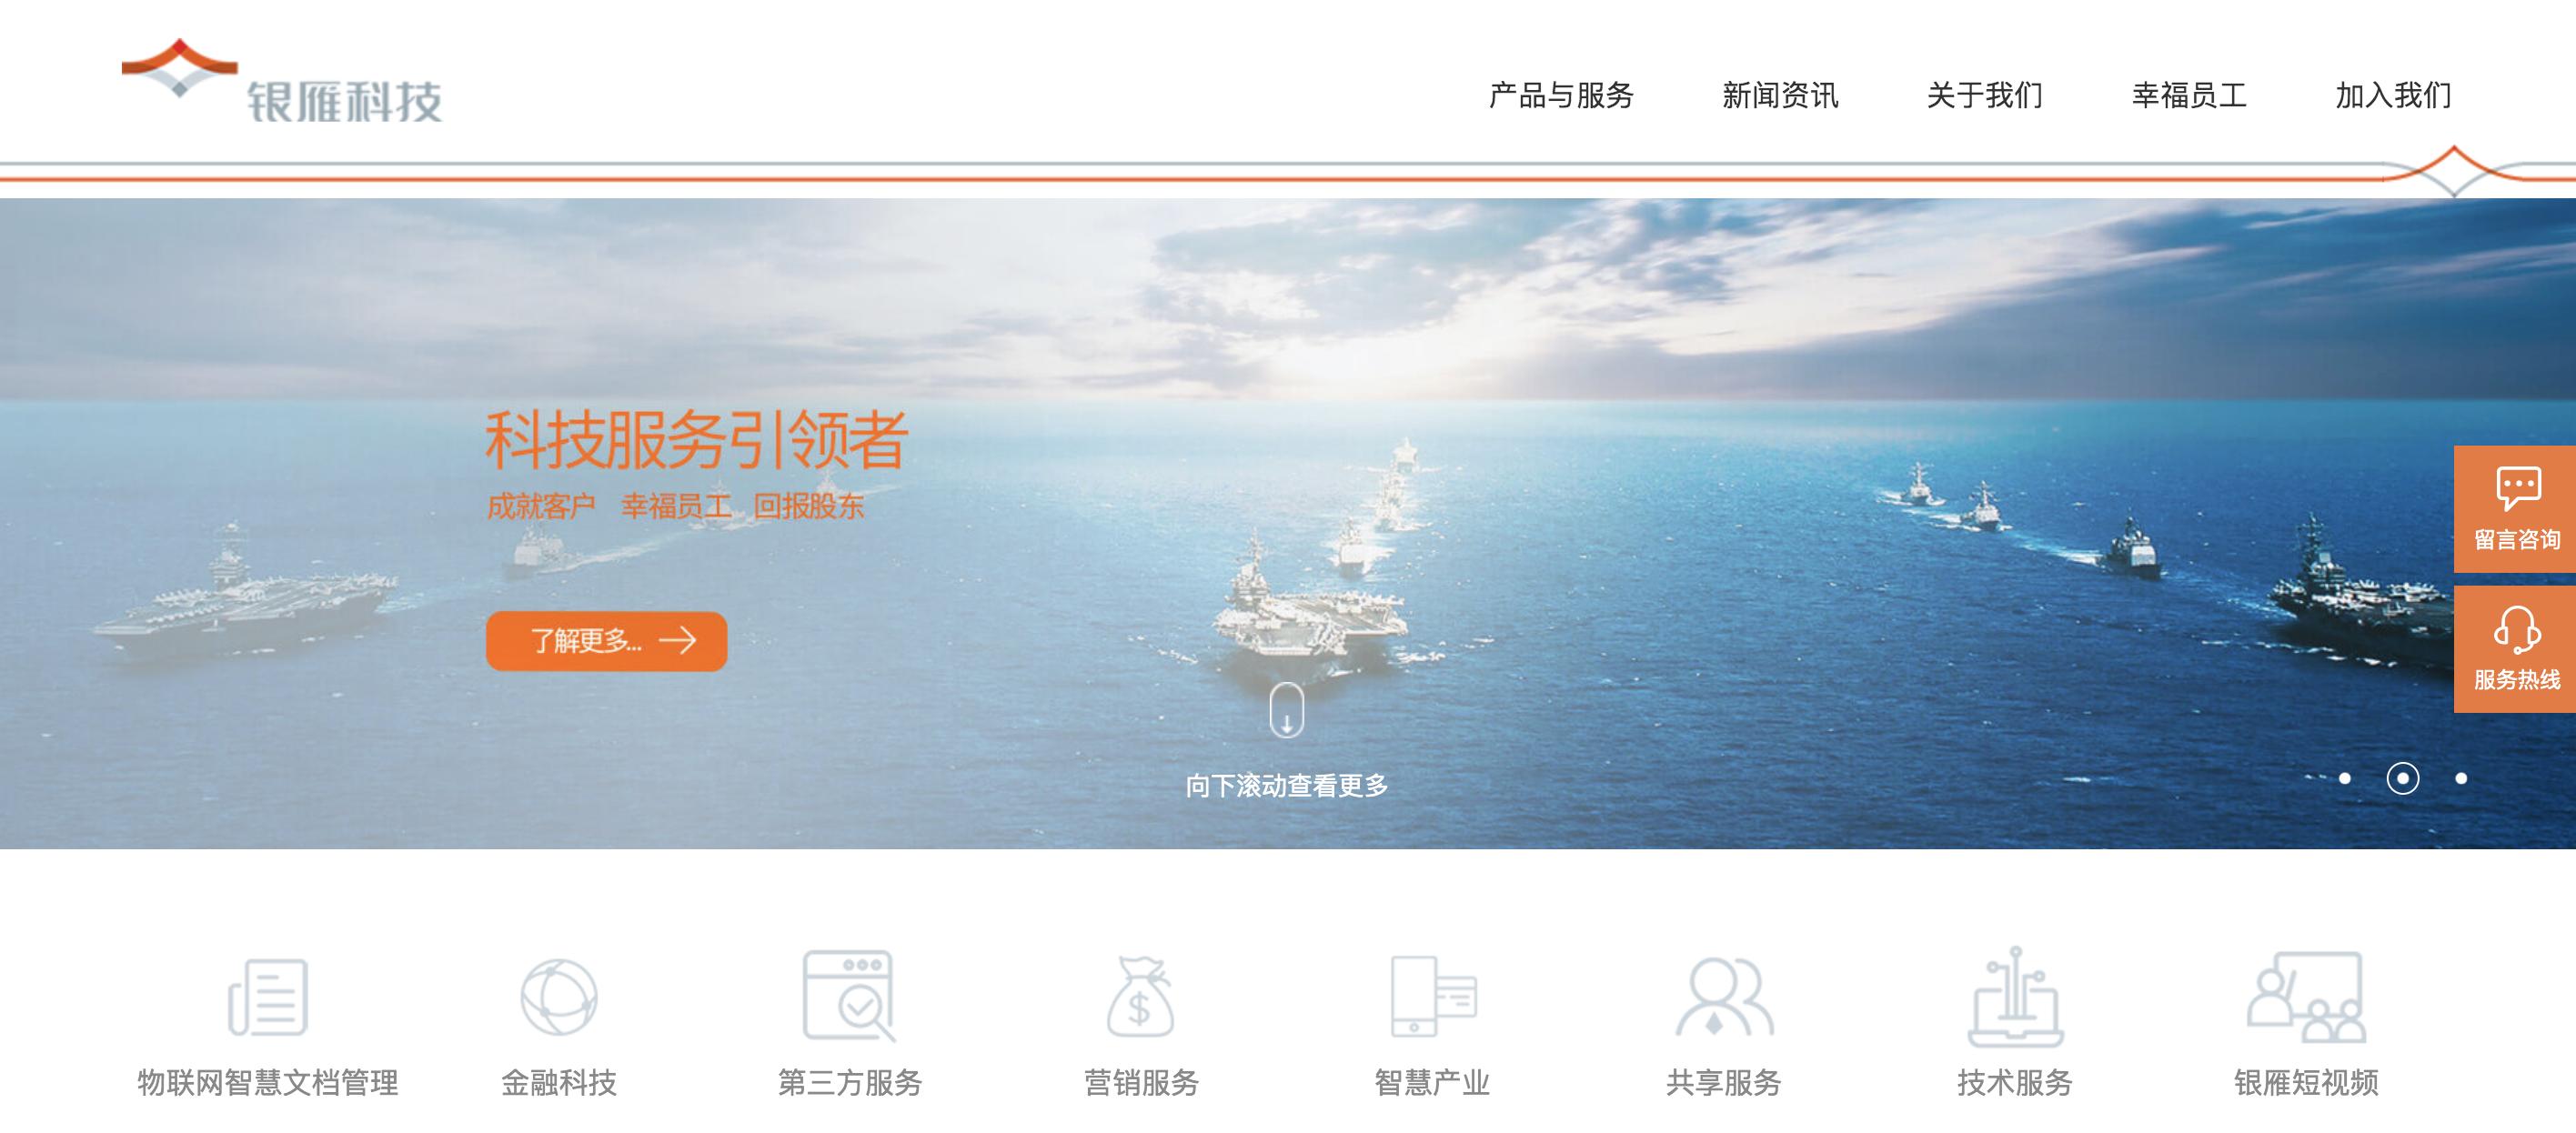 logo扁平瘦长的公司网站怎么设计高大上